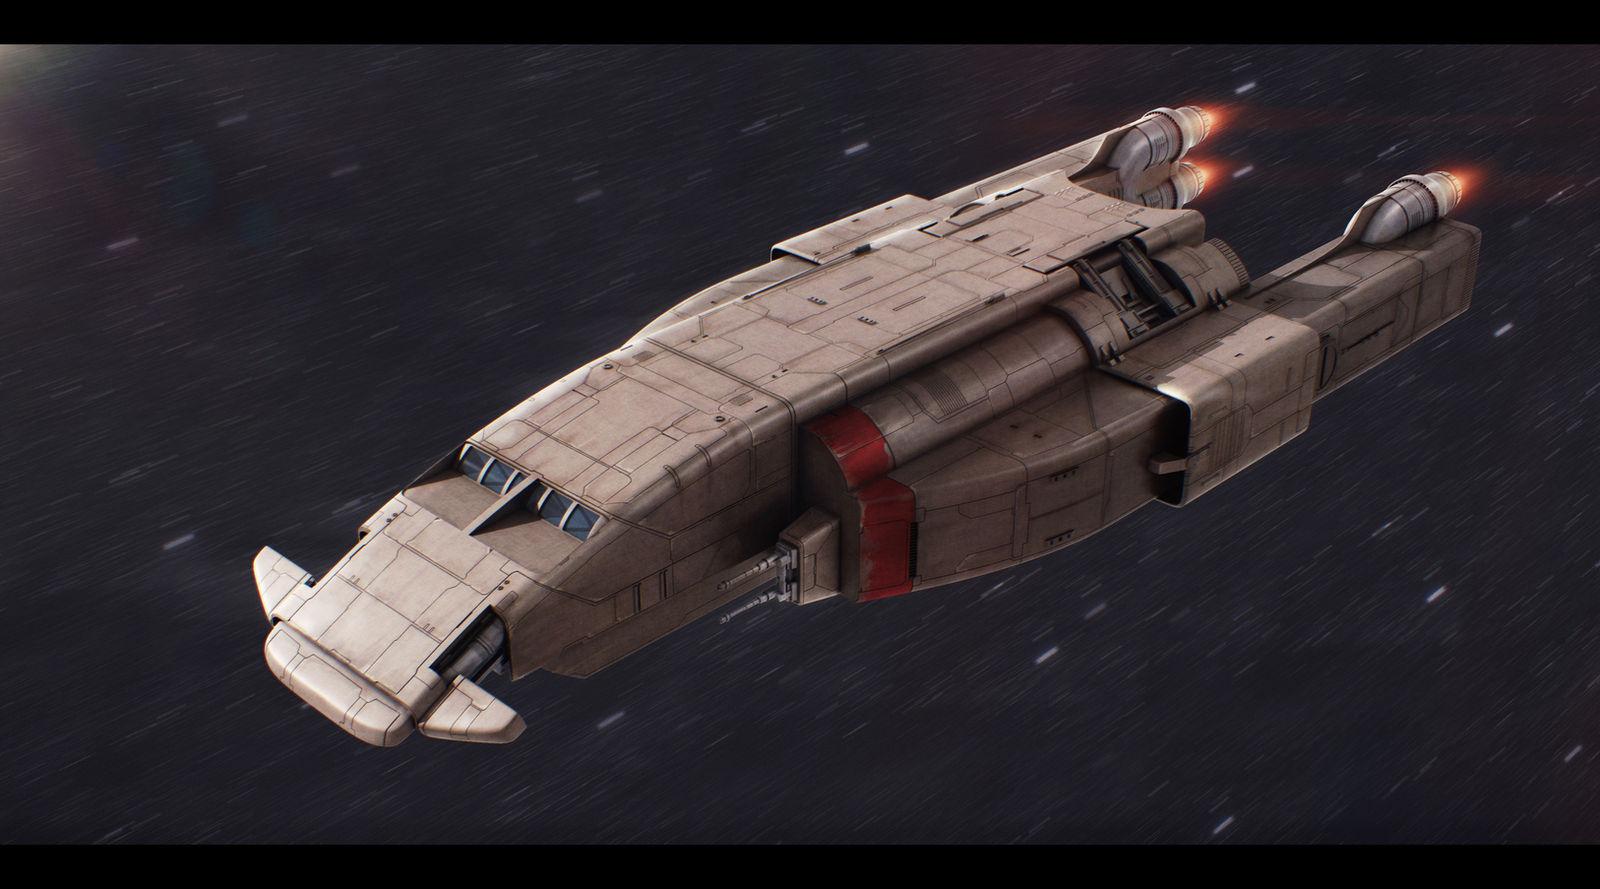 corellispace_csl_232_light_freighter_by_shoguneagle_dcre21r-fullview.jpg